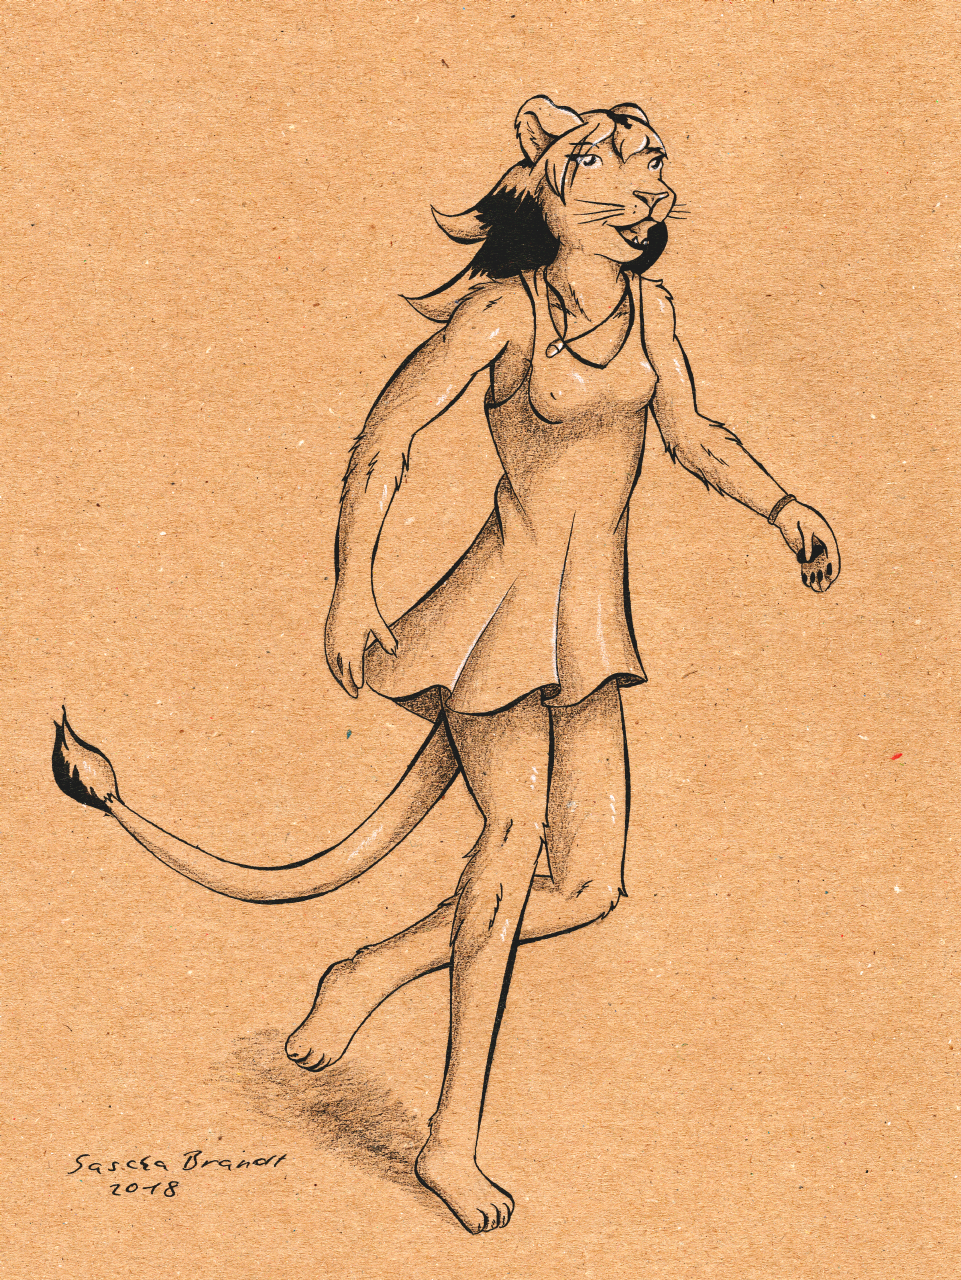 Most recent image: Sandra running